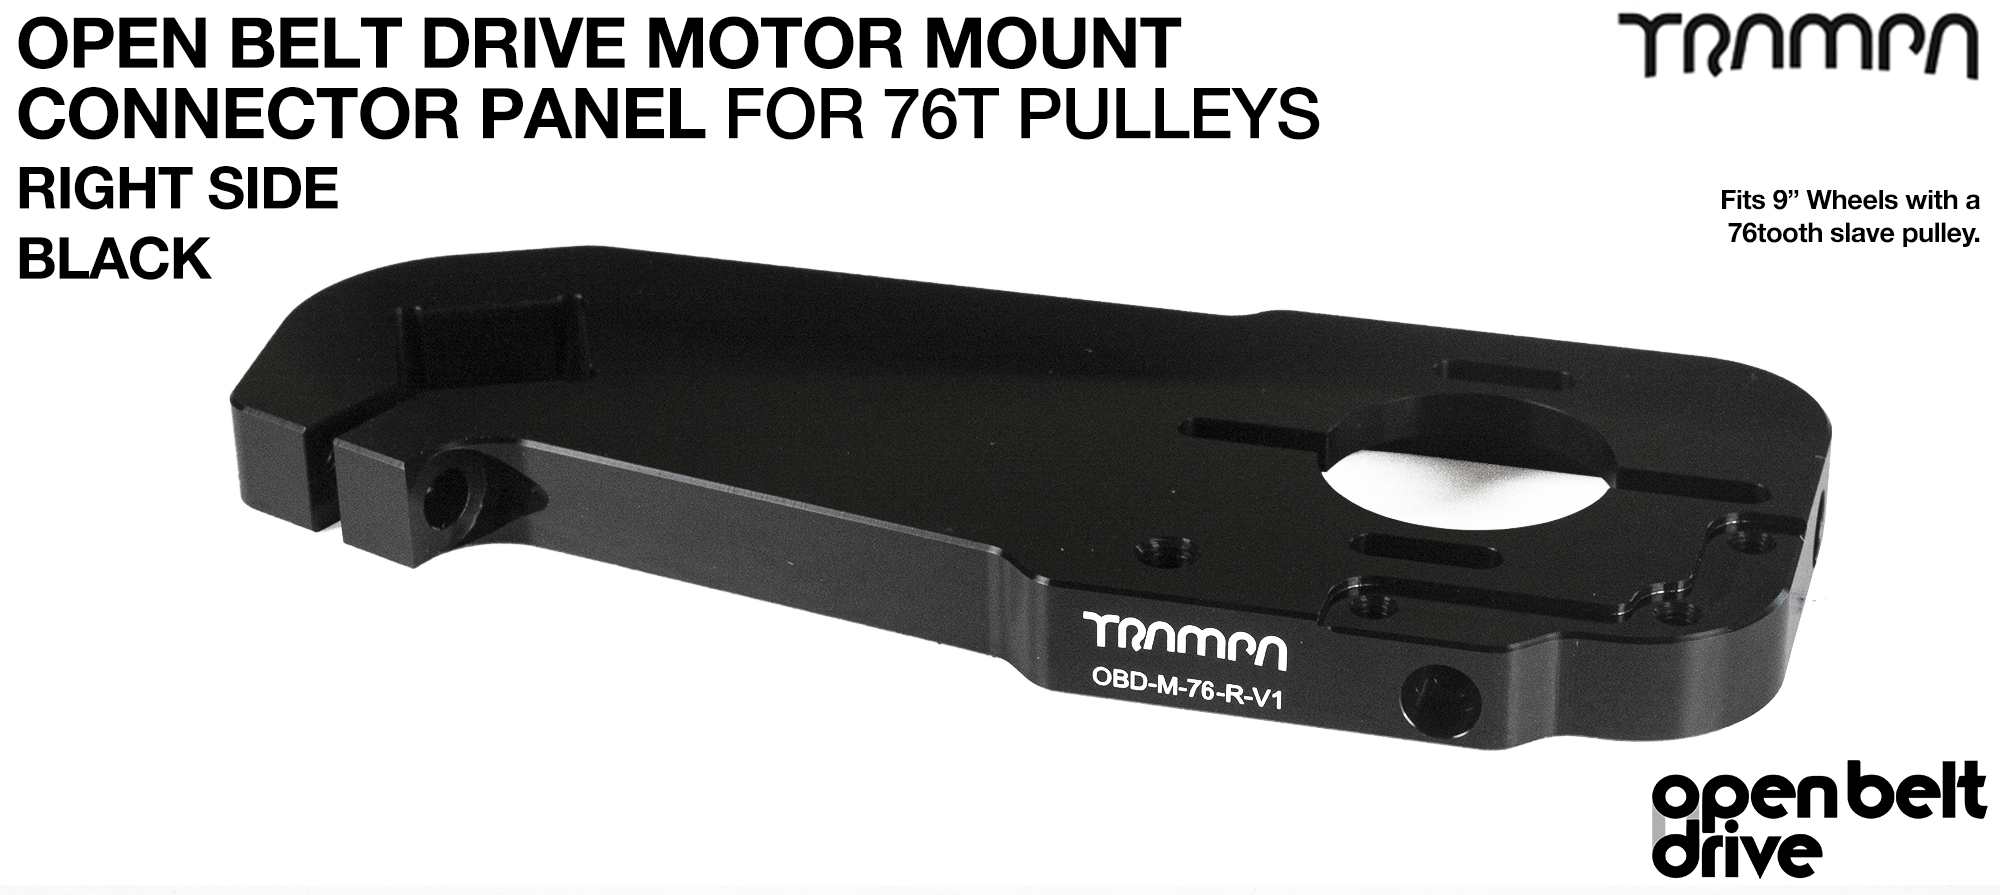 BLACK 76T GOOFY OBD Motor Mount Connector Panel